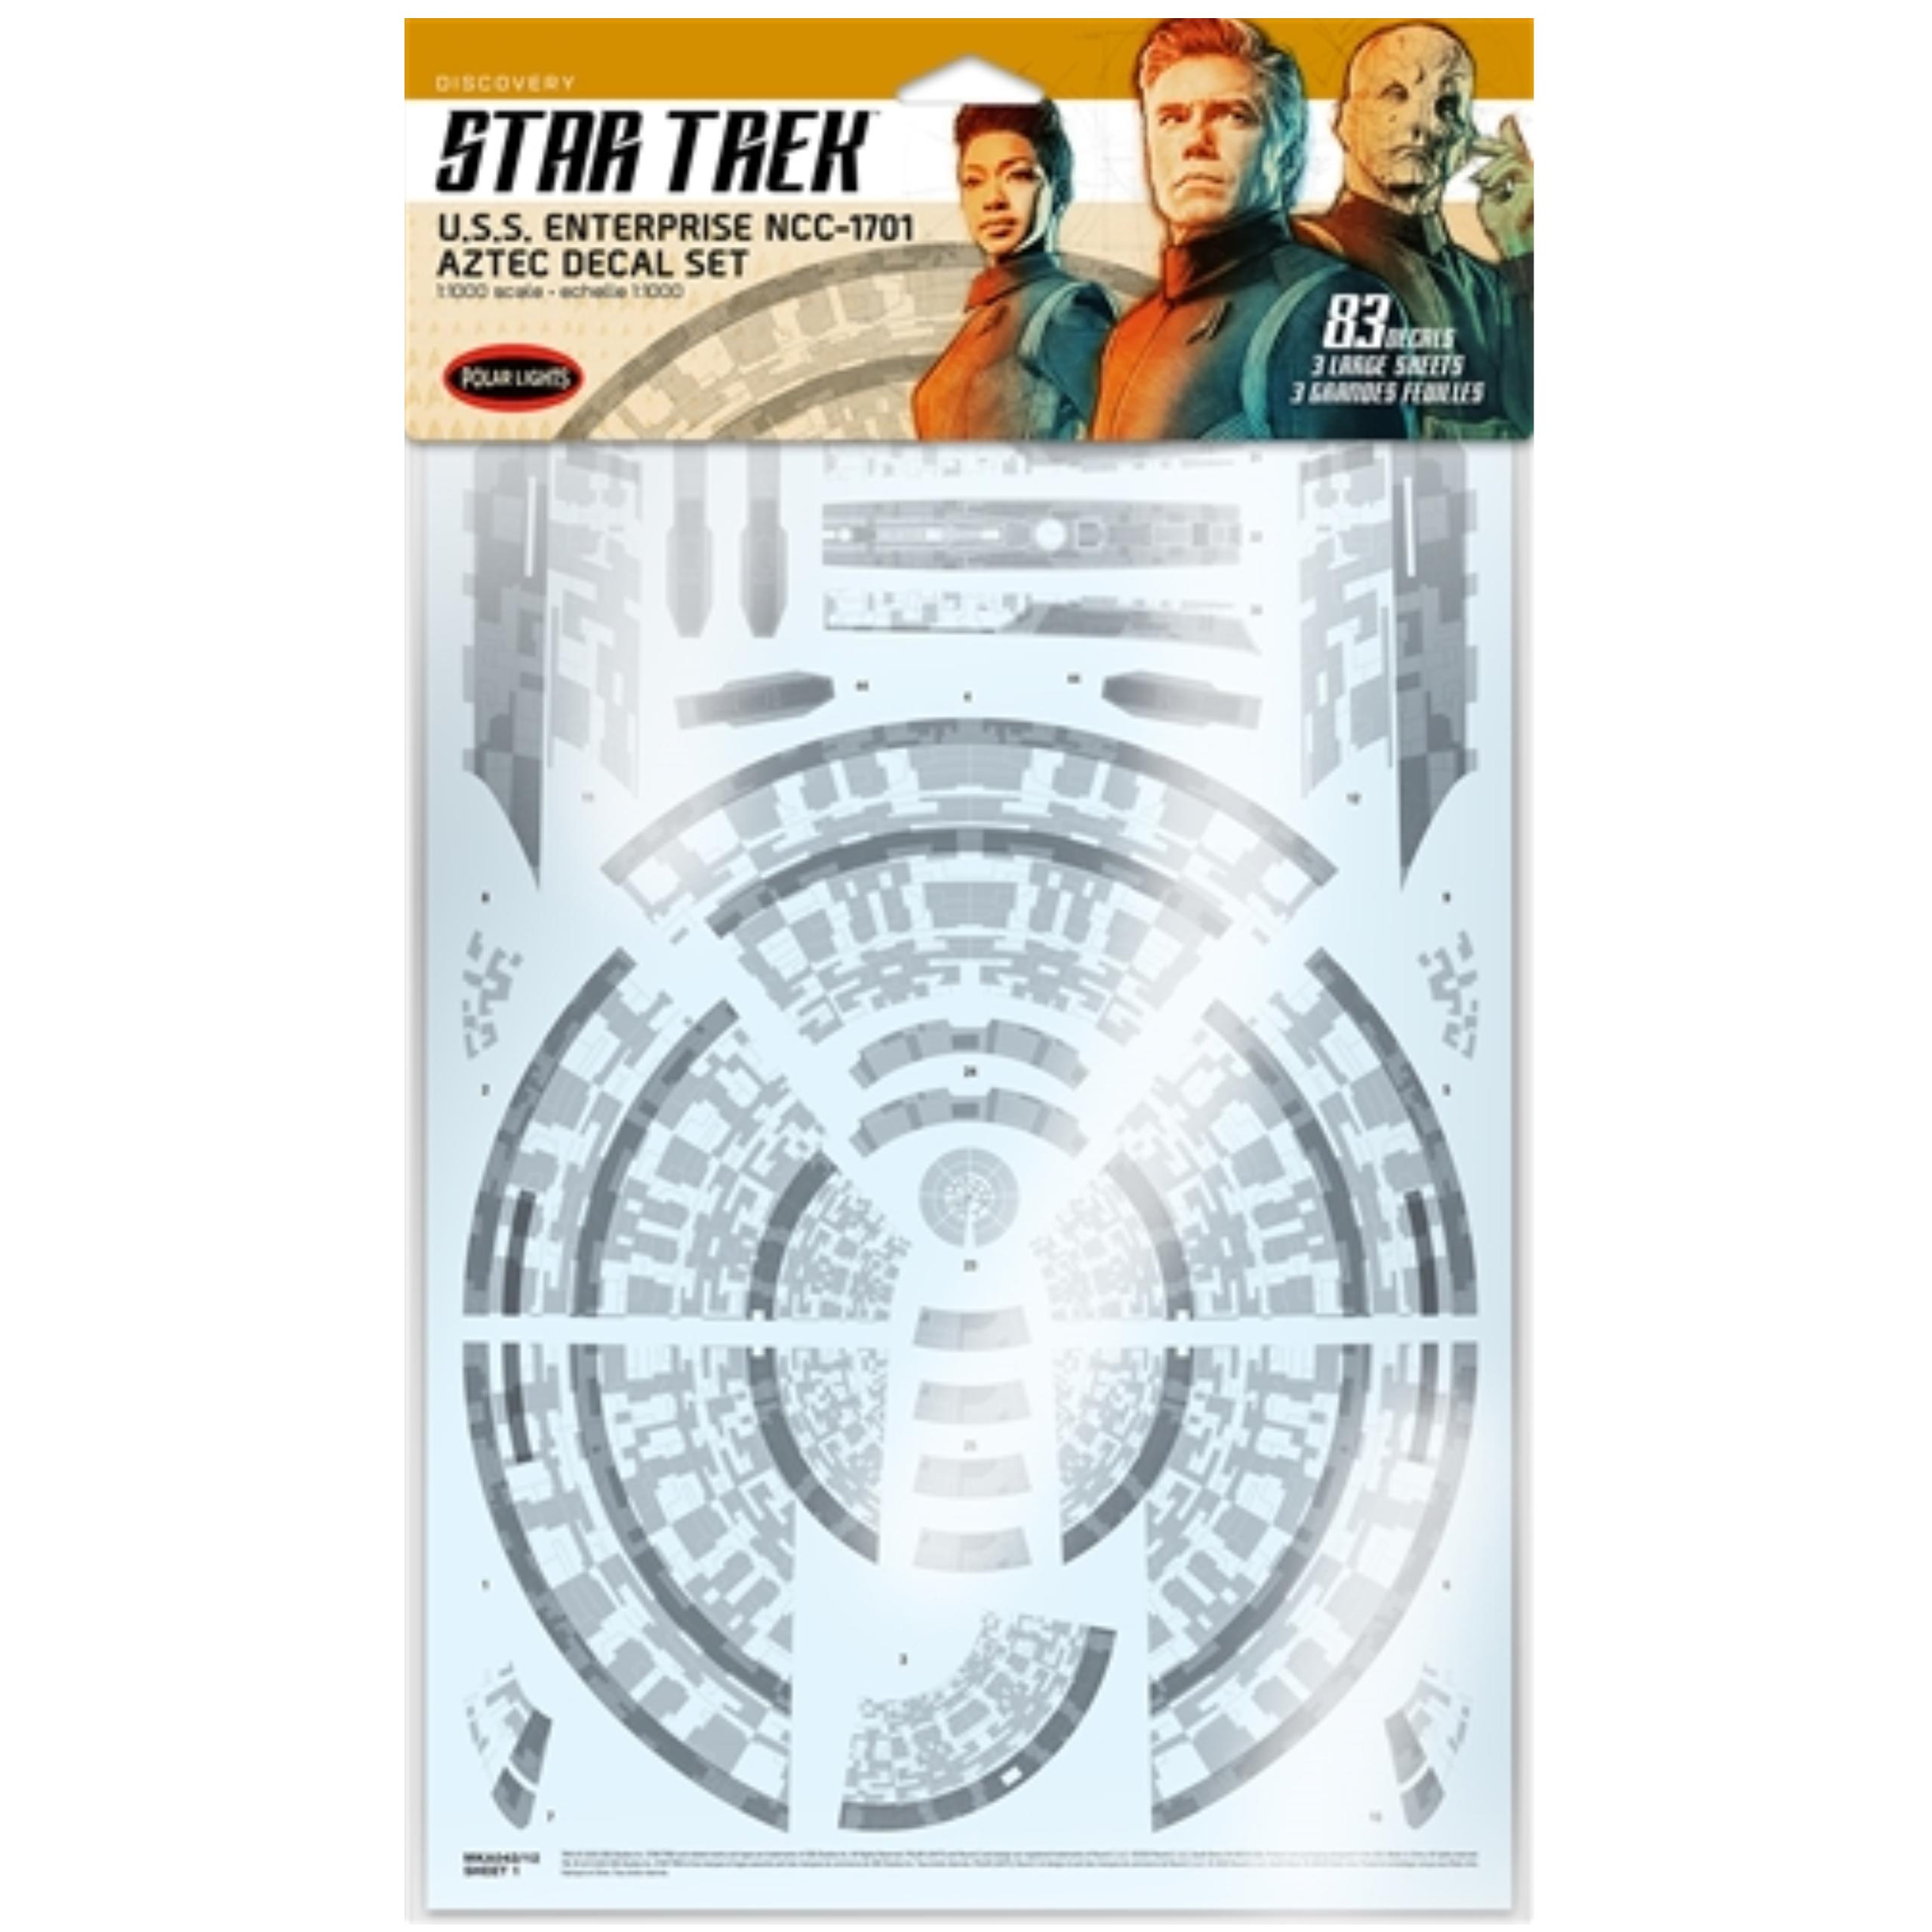 Star Trek Discovery U.S.S Enterprise Aztec Decal Set 1:1000 Scale MKA042